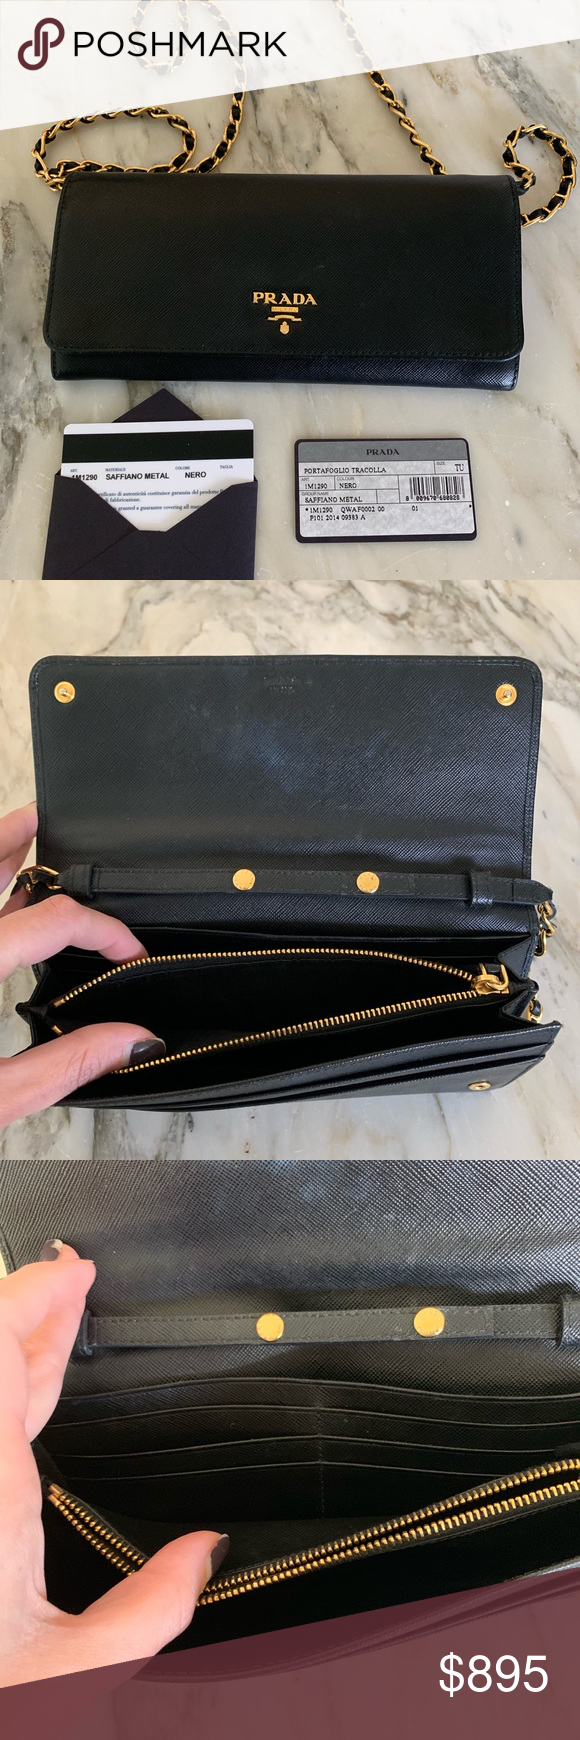 fcff195a4080 Black Prada Saffiano crossbody wallet Convertible clutch/wallet/crossbody.  Style 1M1290. 6